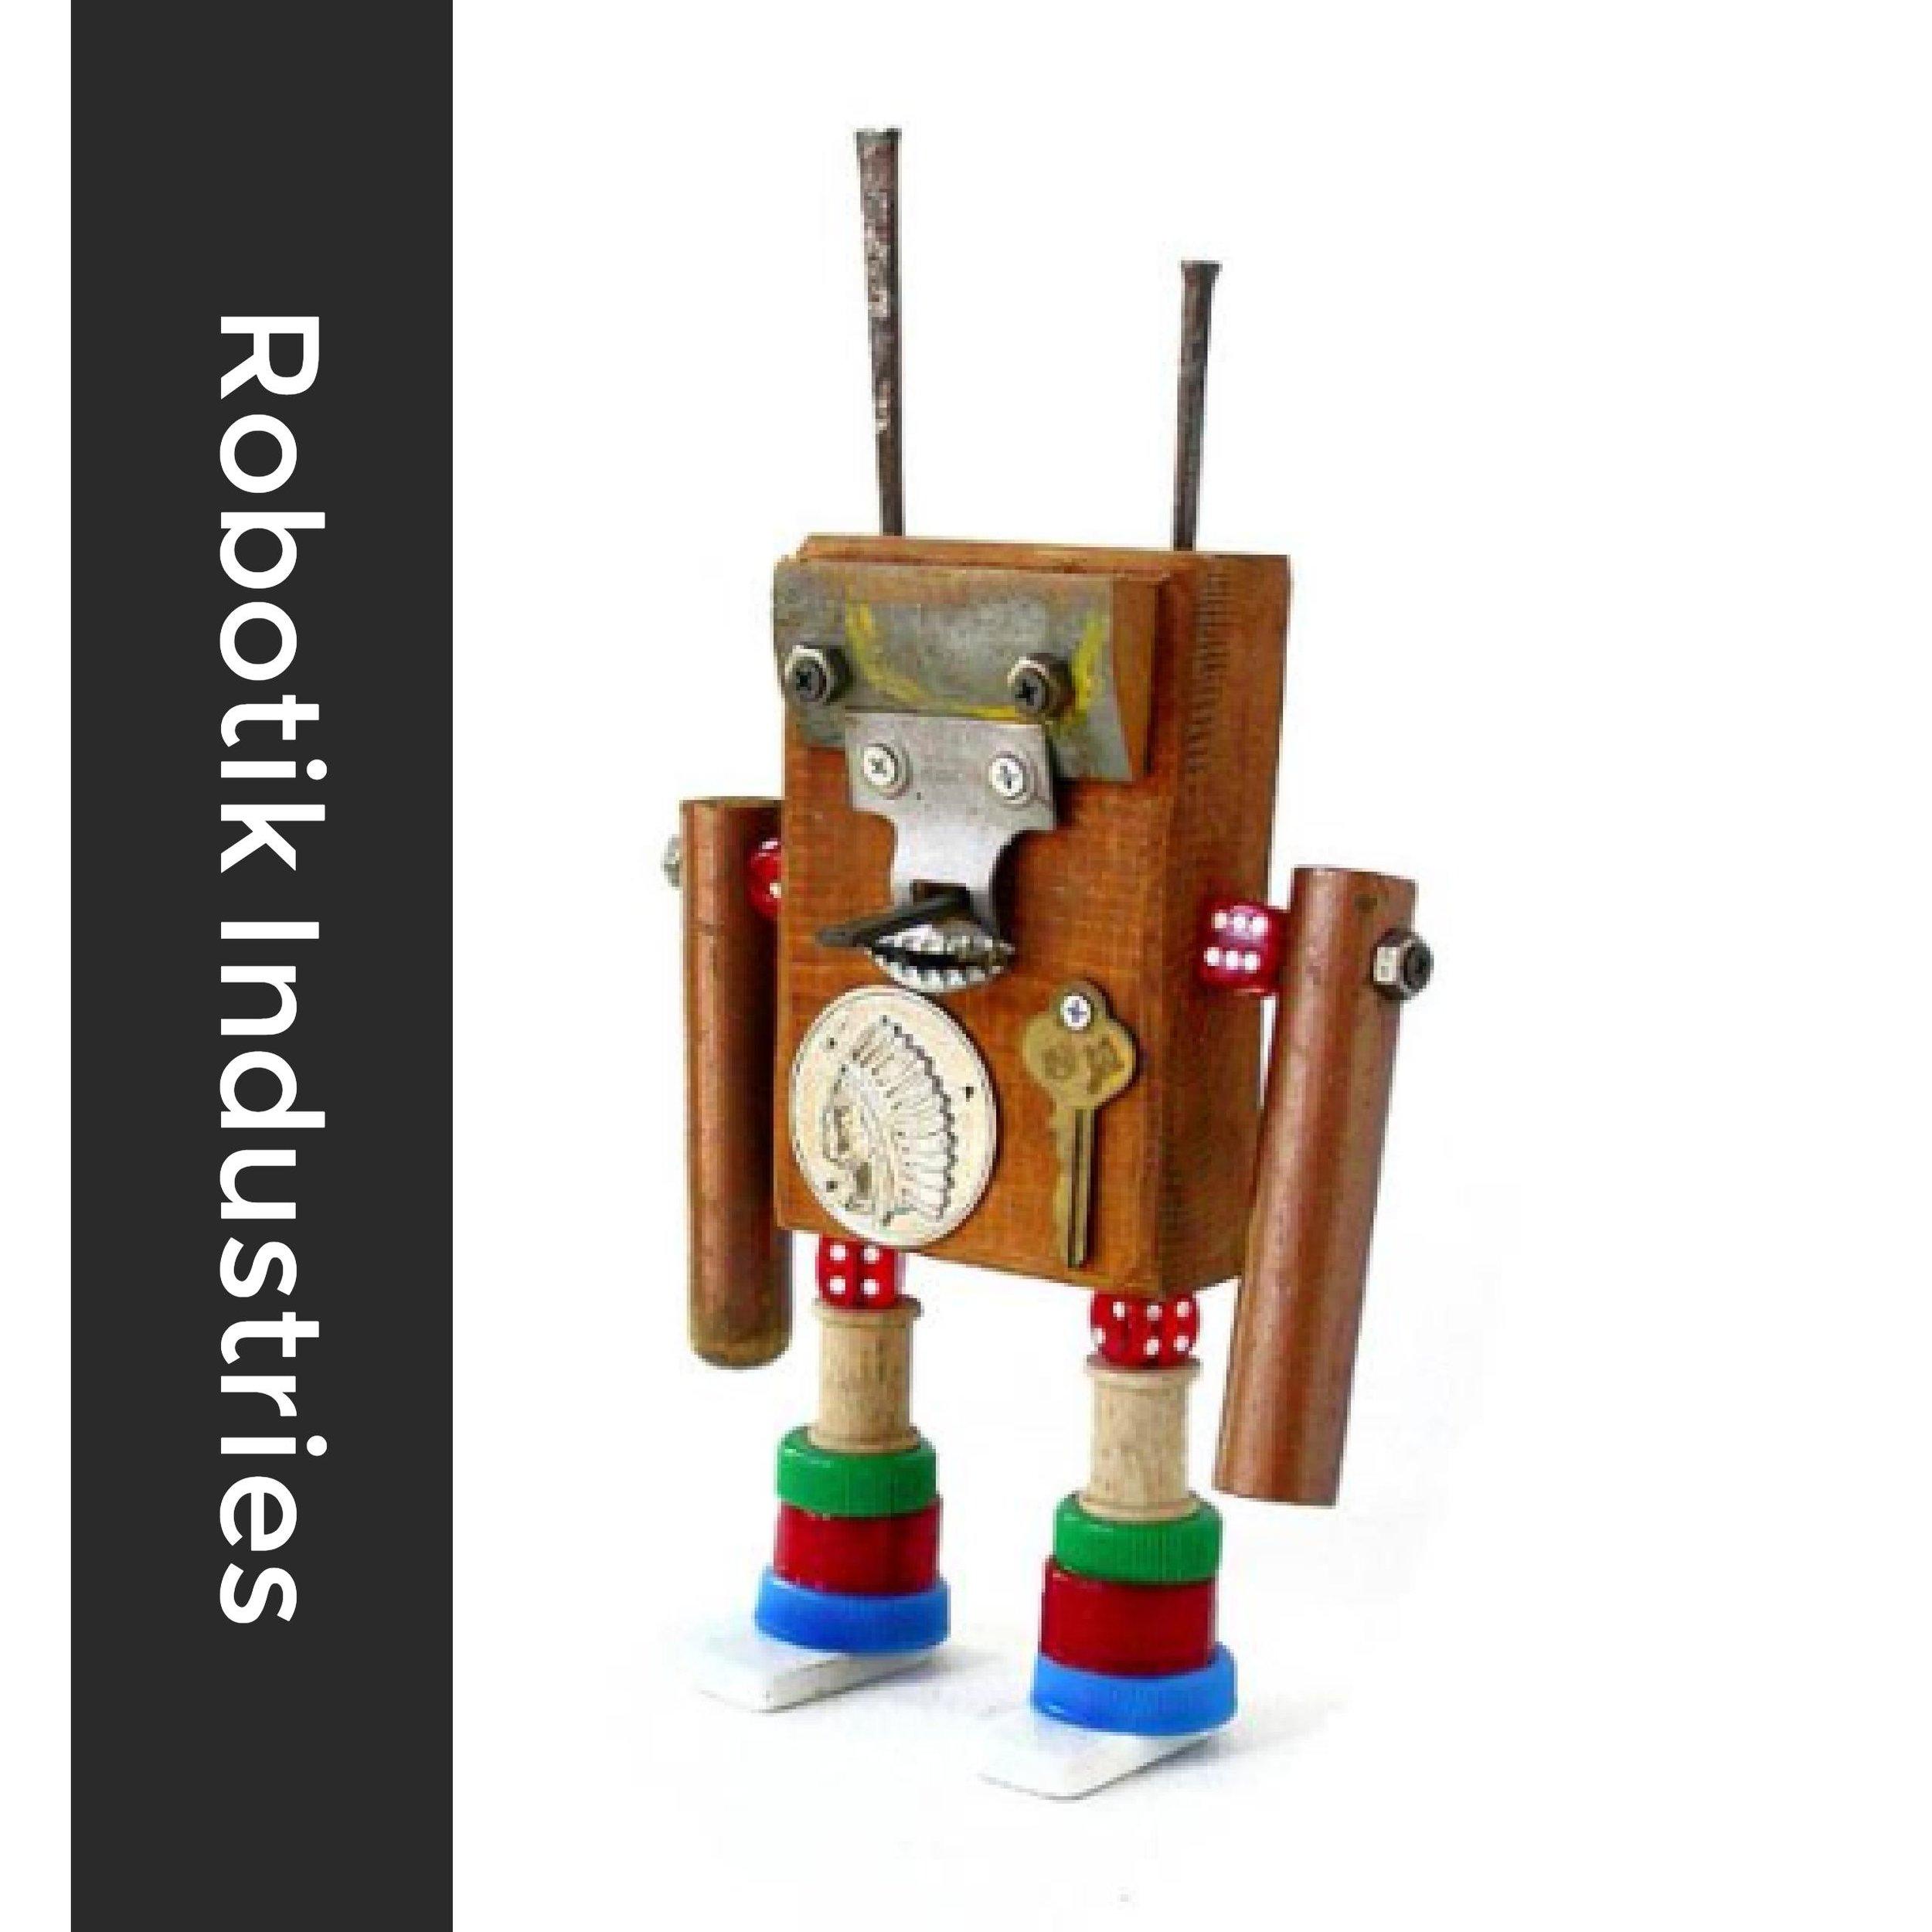 Robotik Industries